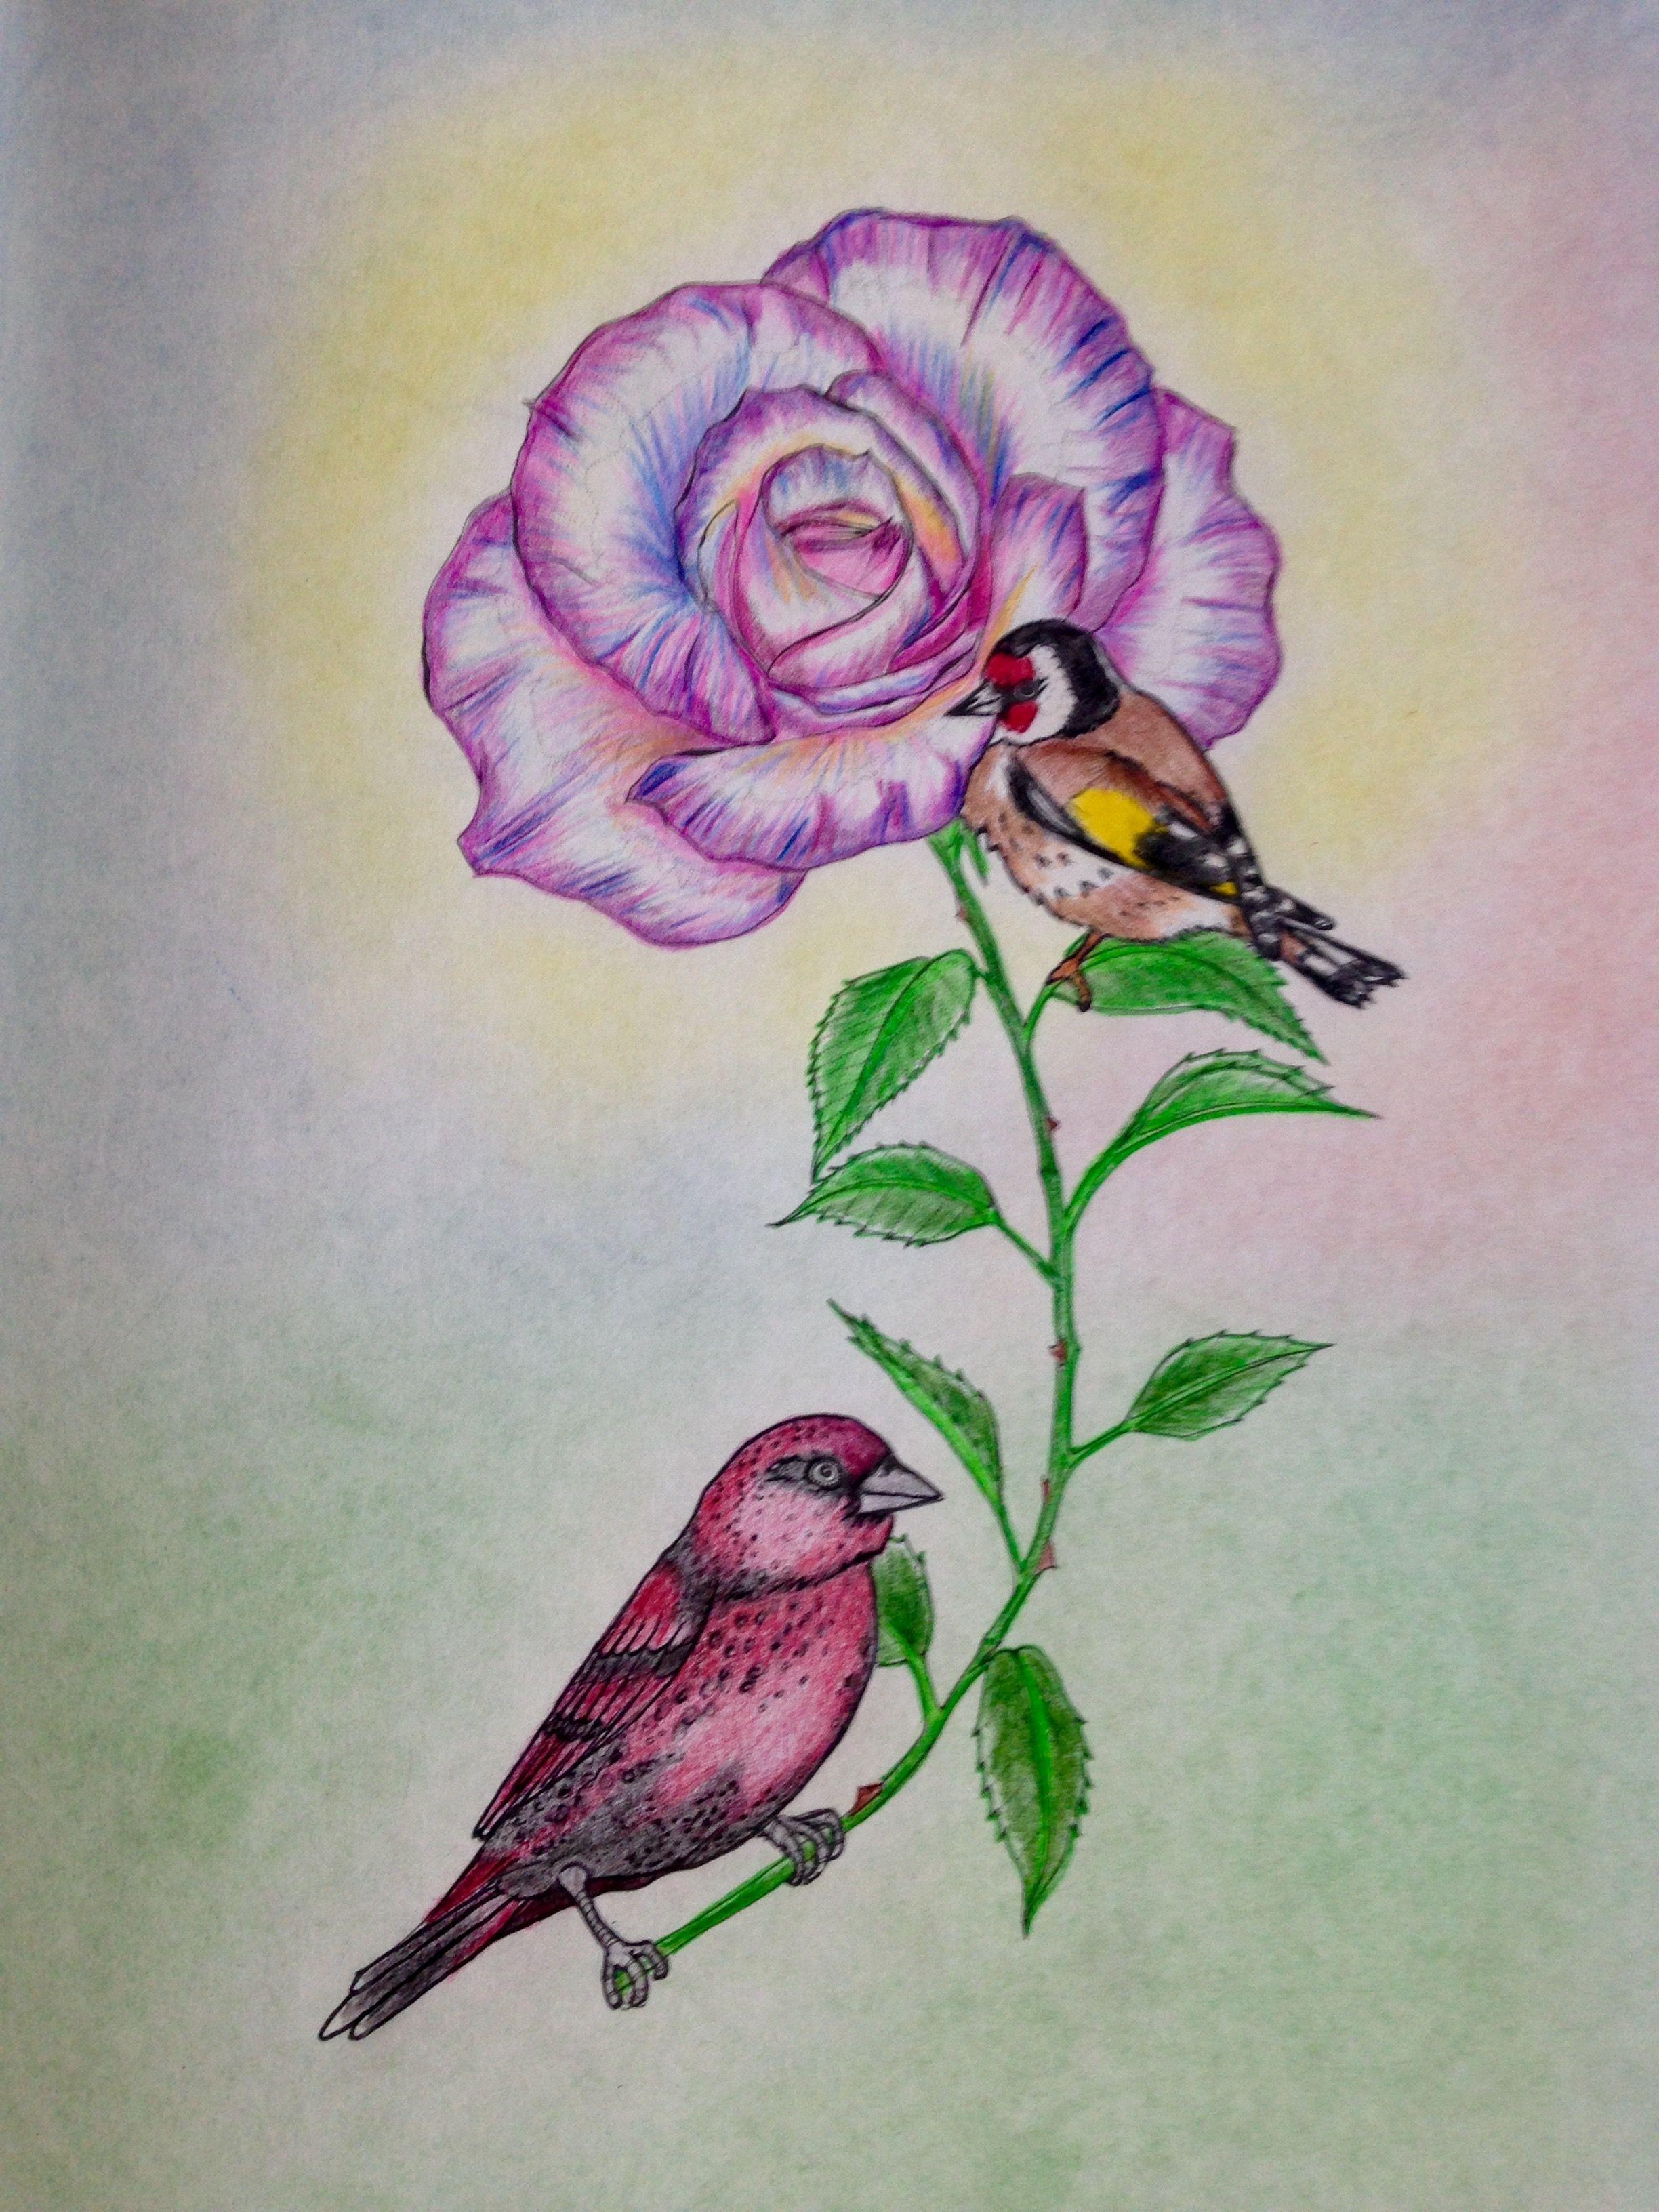 Coloring Book Birdtopia Daisy Fletcher Coloring Books Colored Pencil Techniques Drawings